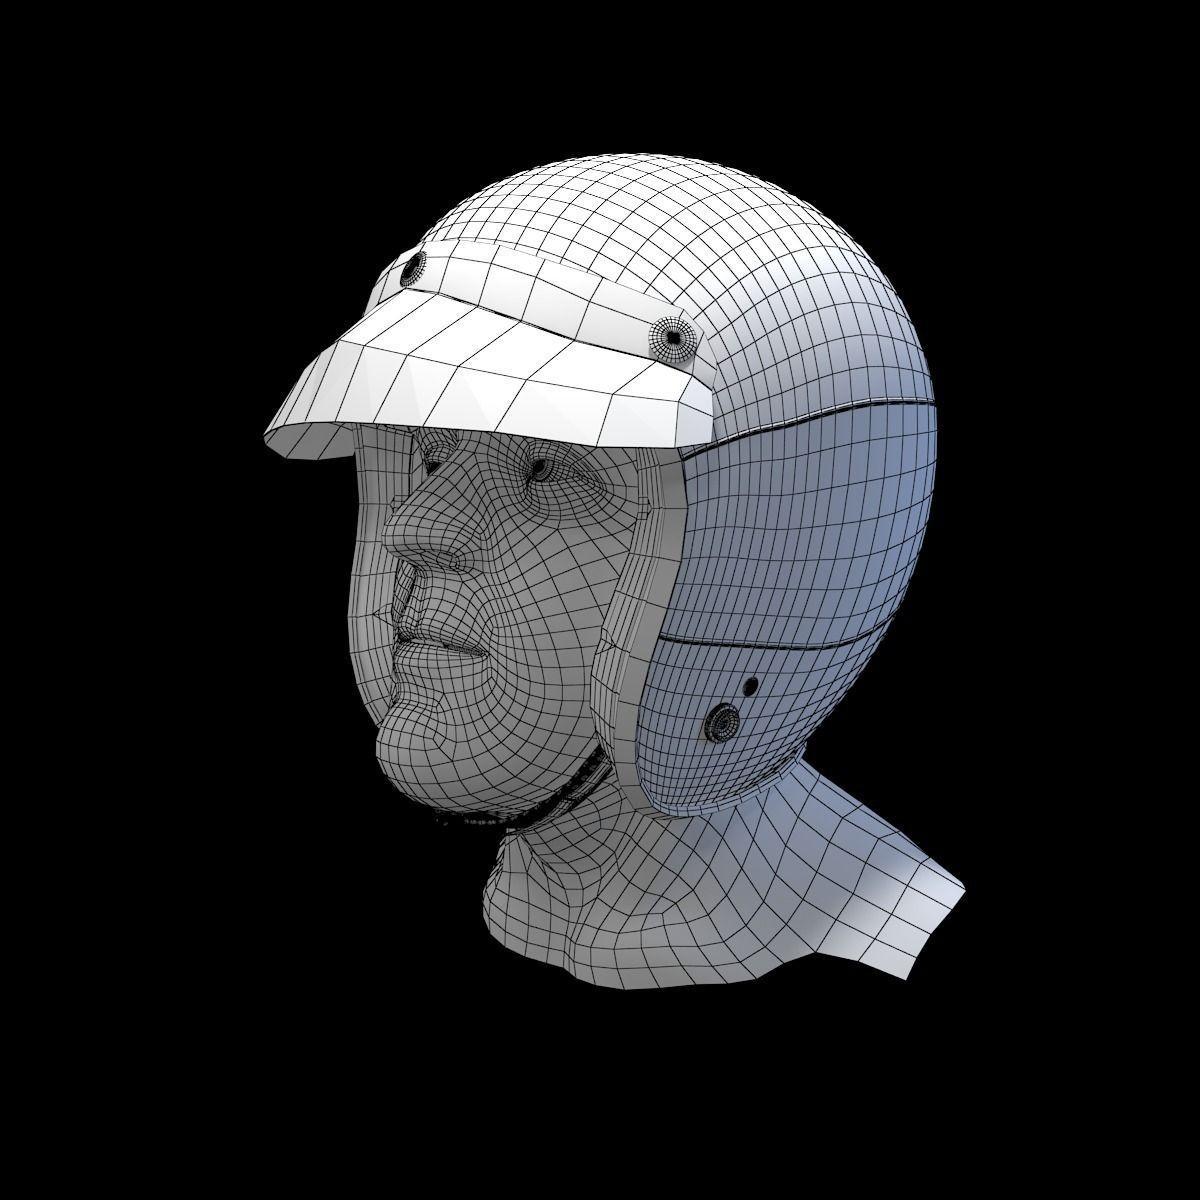 Motorcycle Helmet 3d Model Free Download